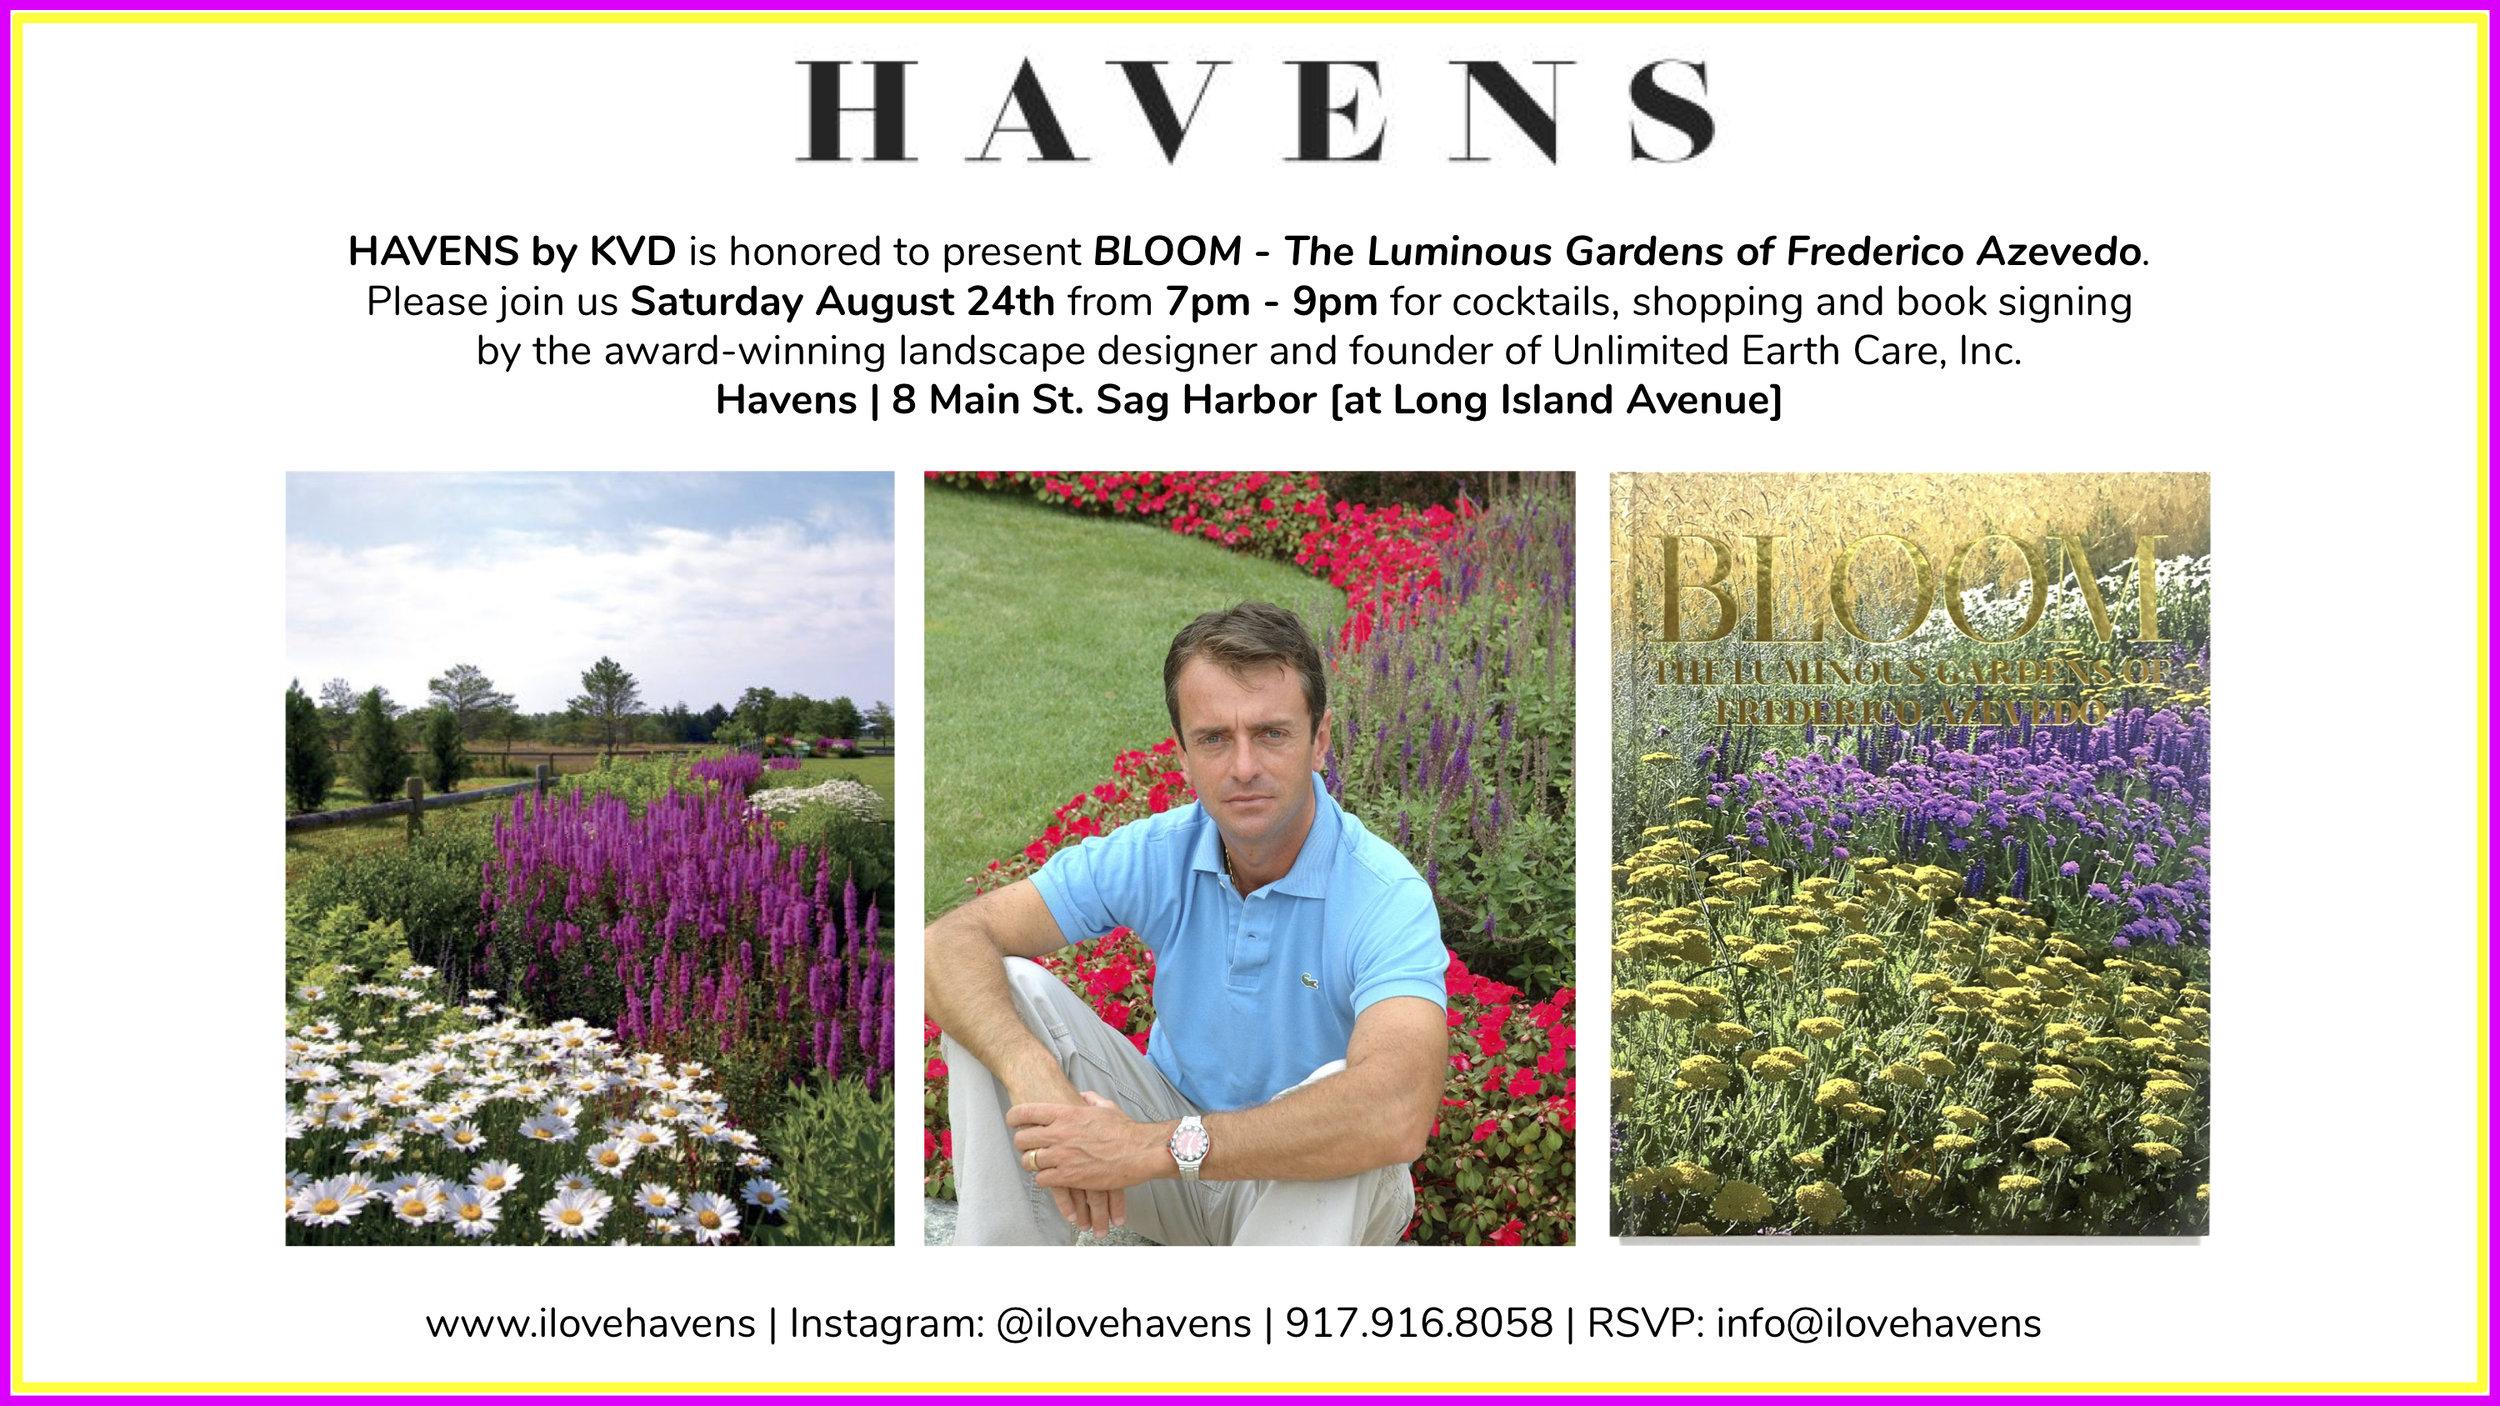 HAVENS Bloom by Frederico Azevedo Evite JPEG.jpg